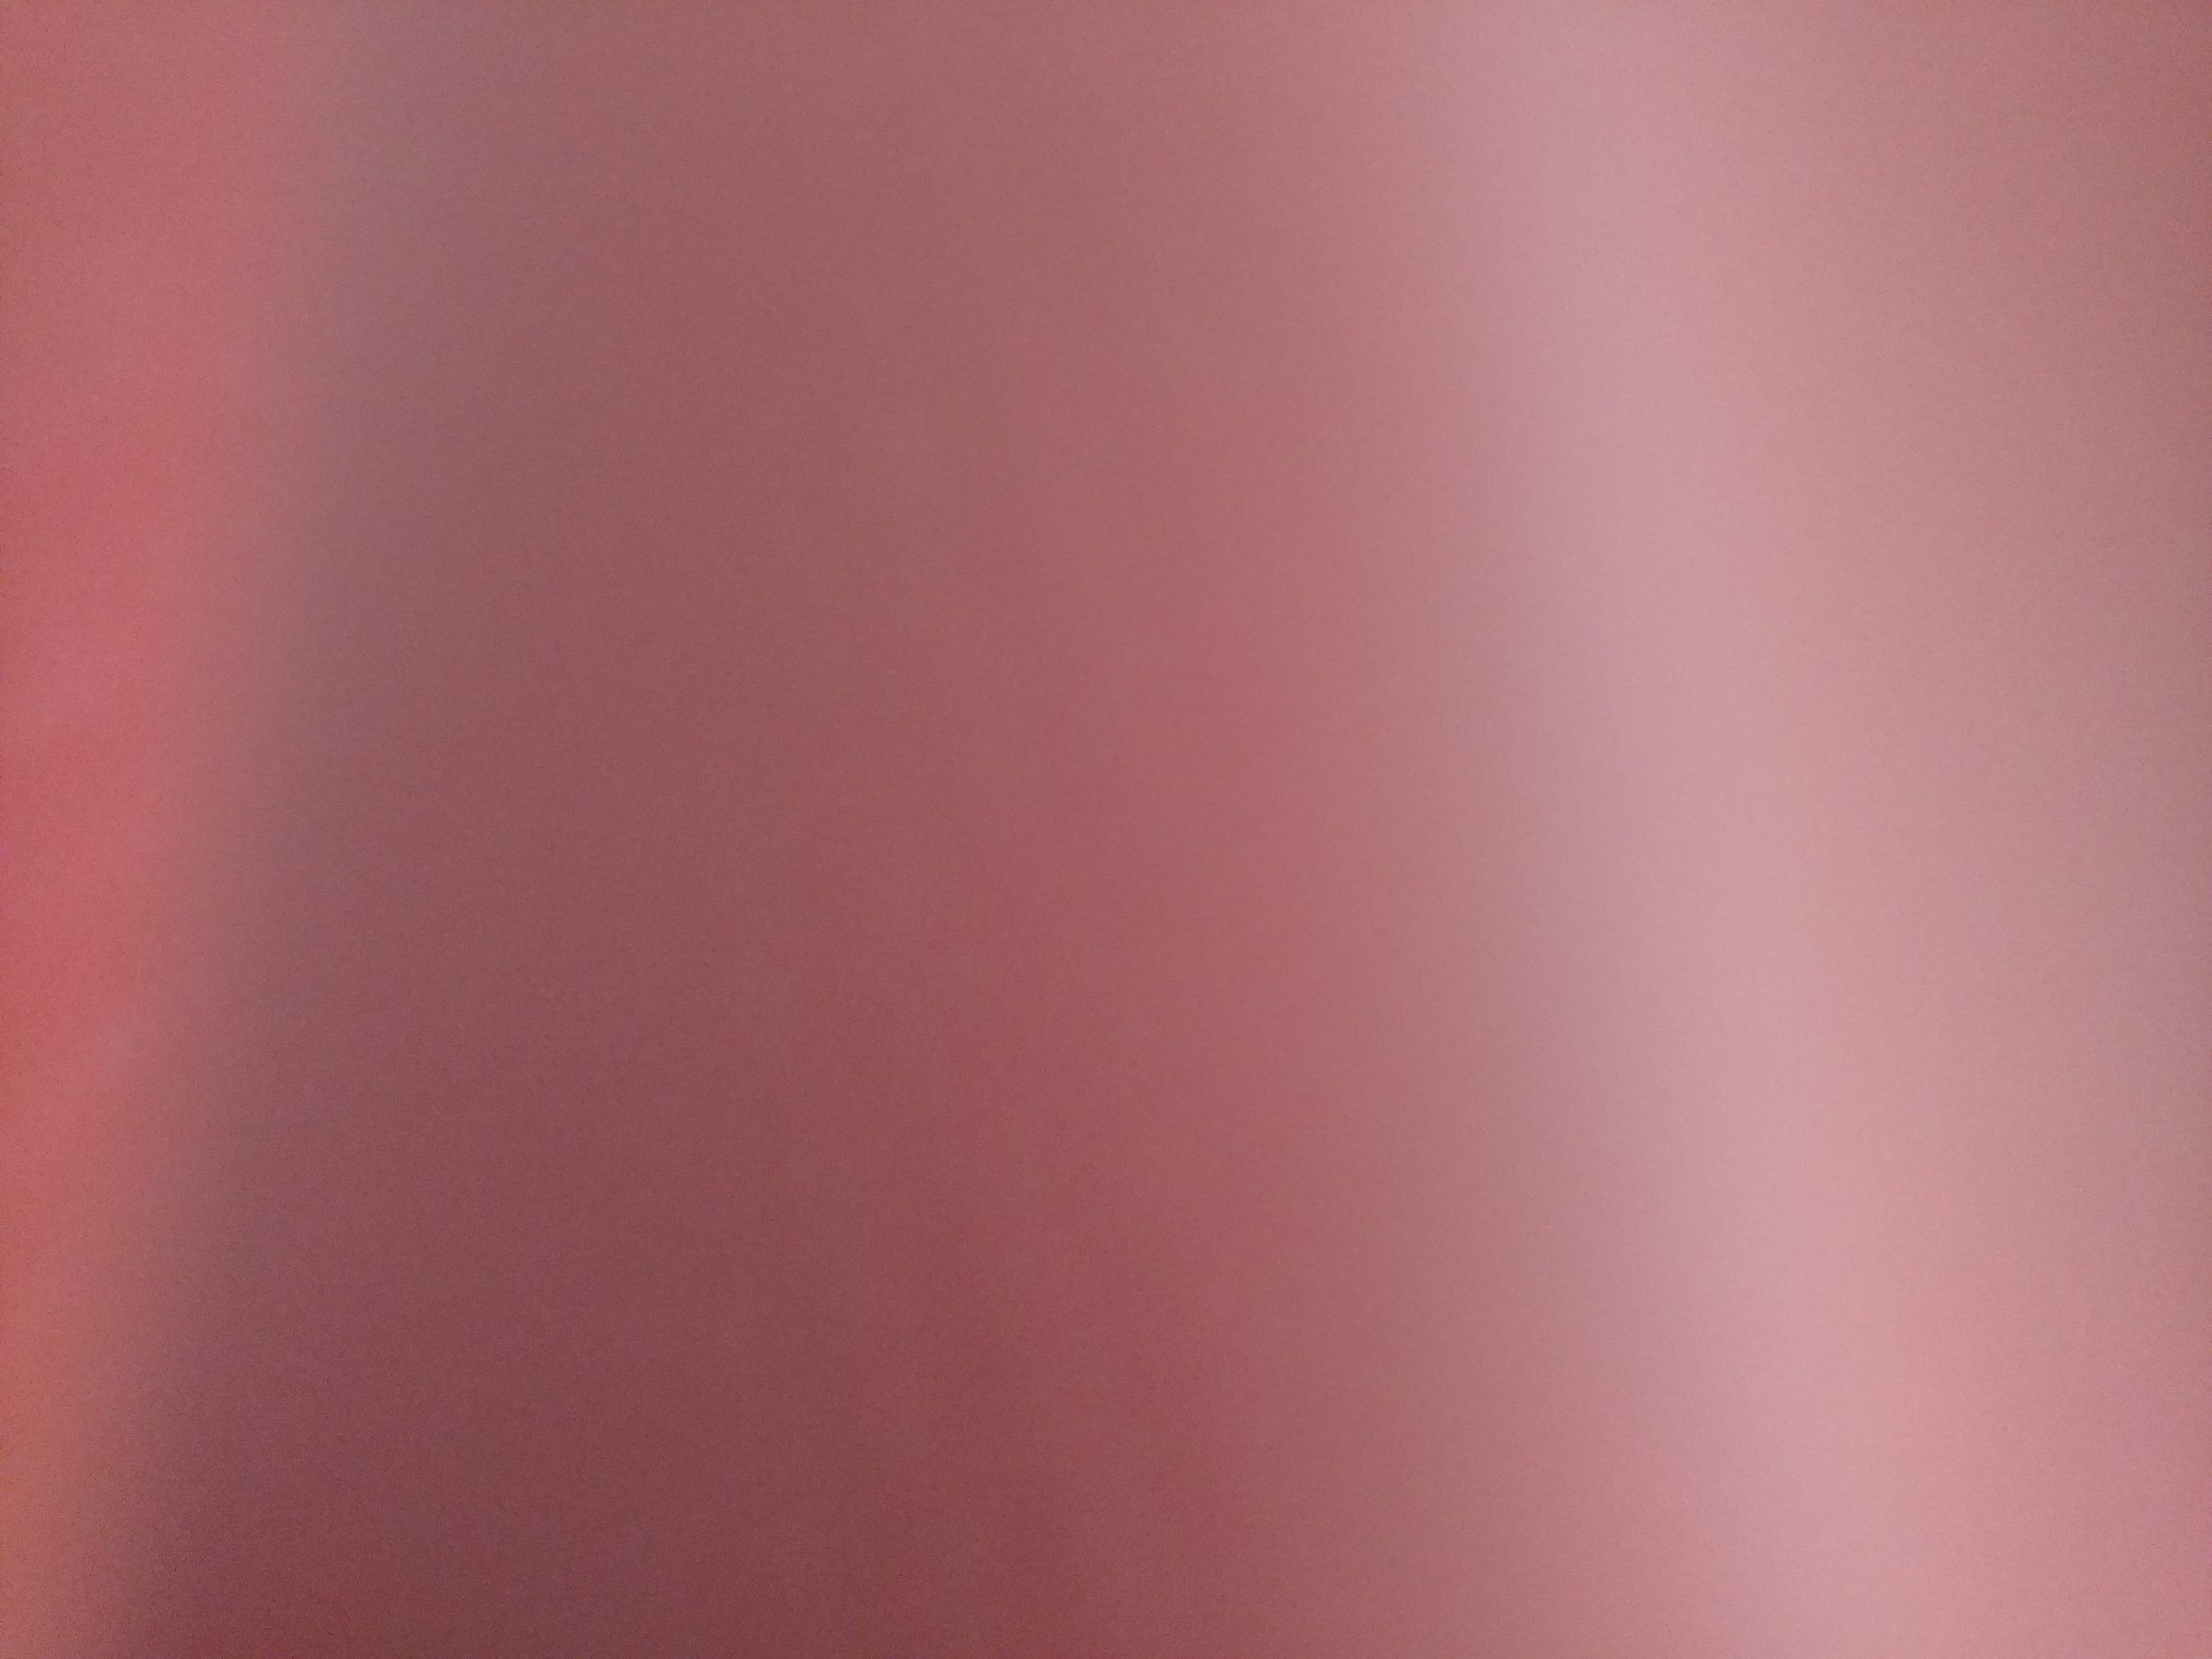 willroth-co-free-texture-gradient-022.jpg